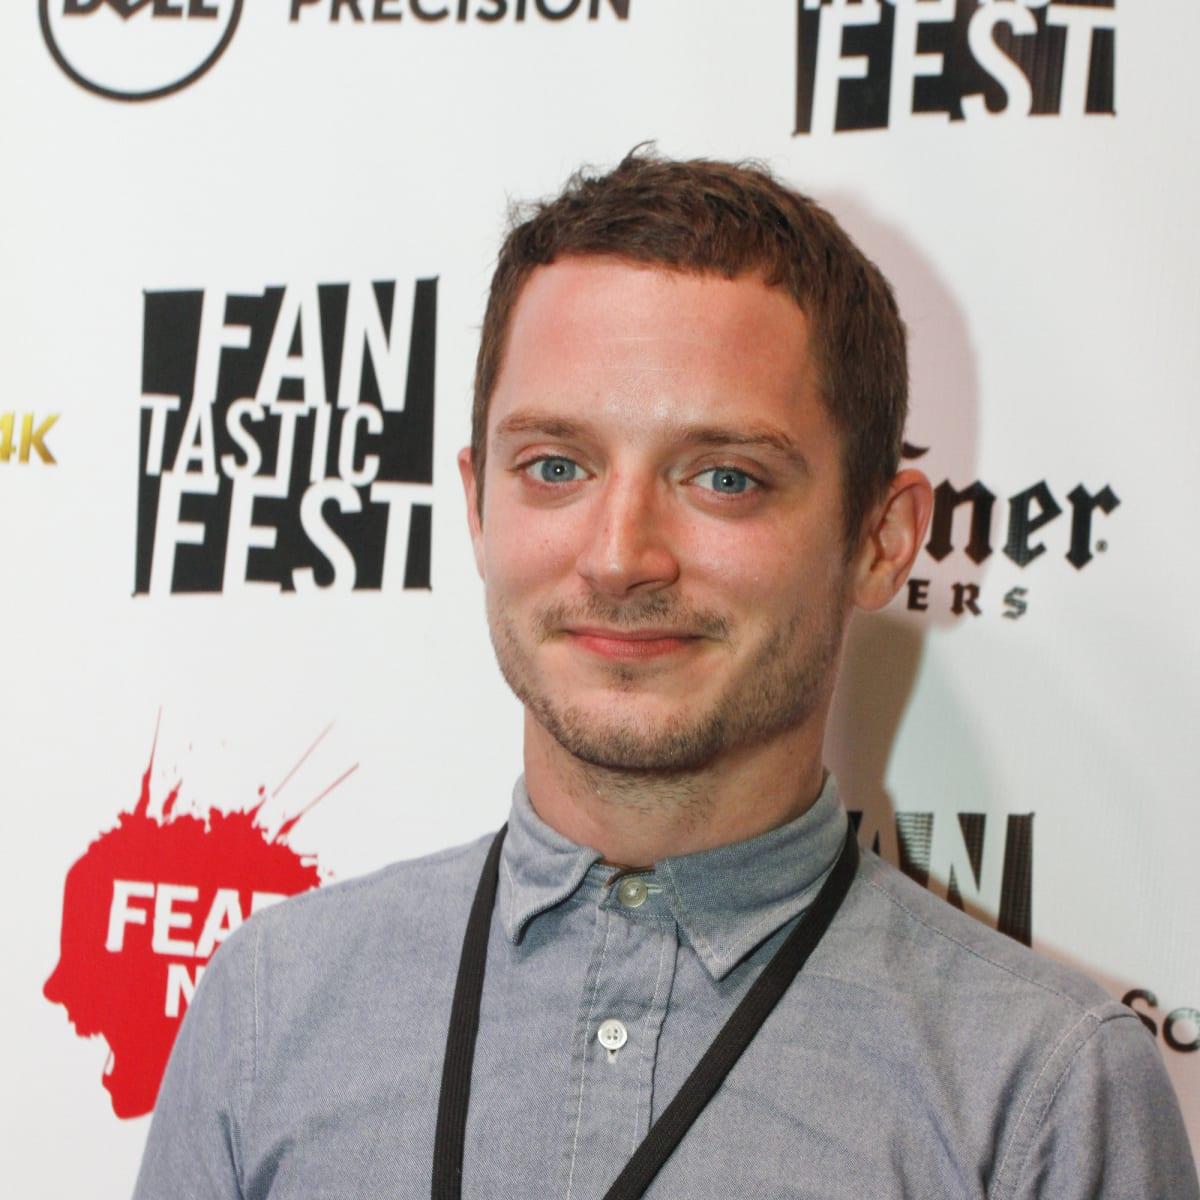 Elijah Wood at red carpet premiere of Grand Piano at Fantastic Fest